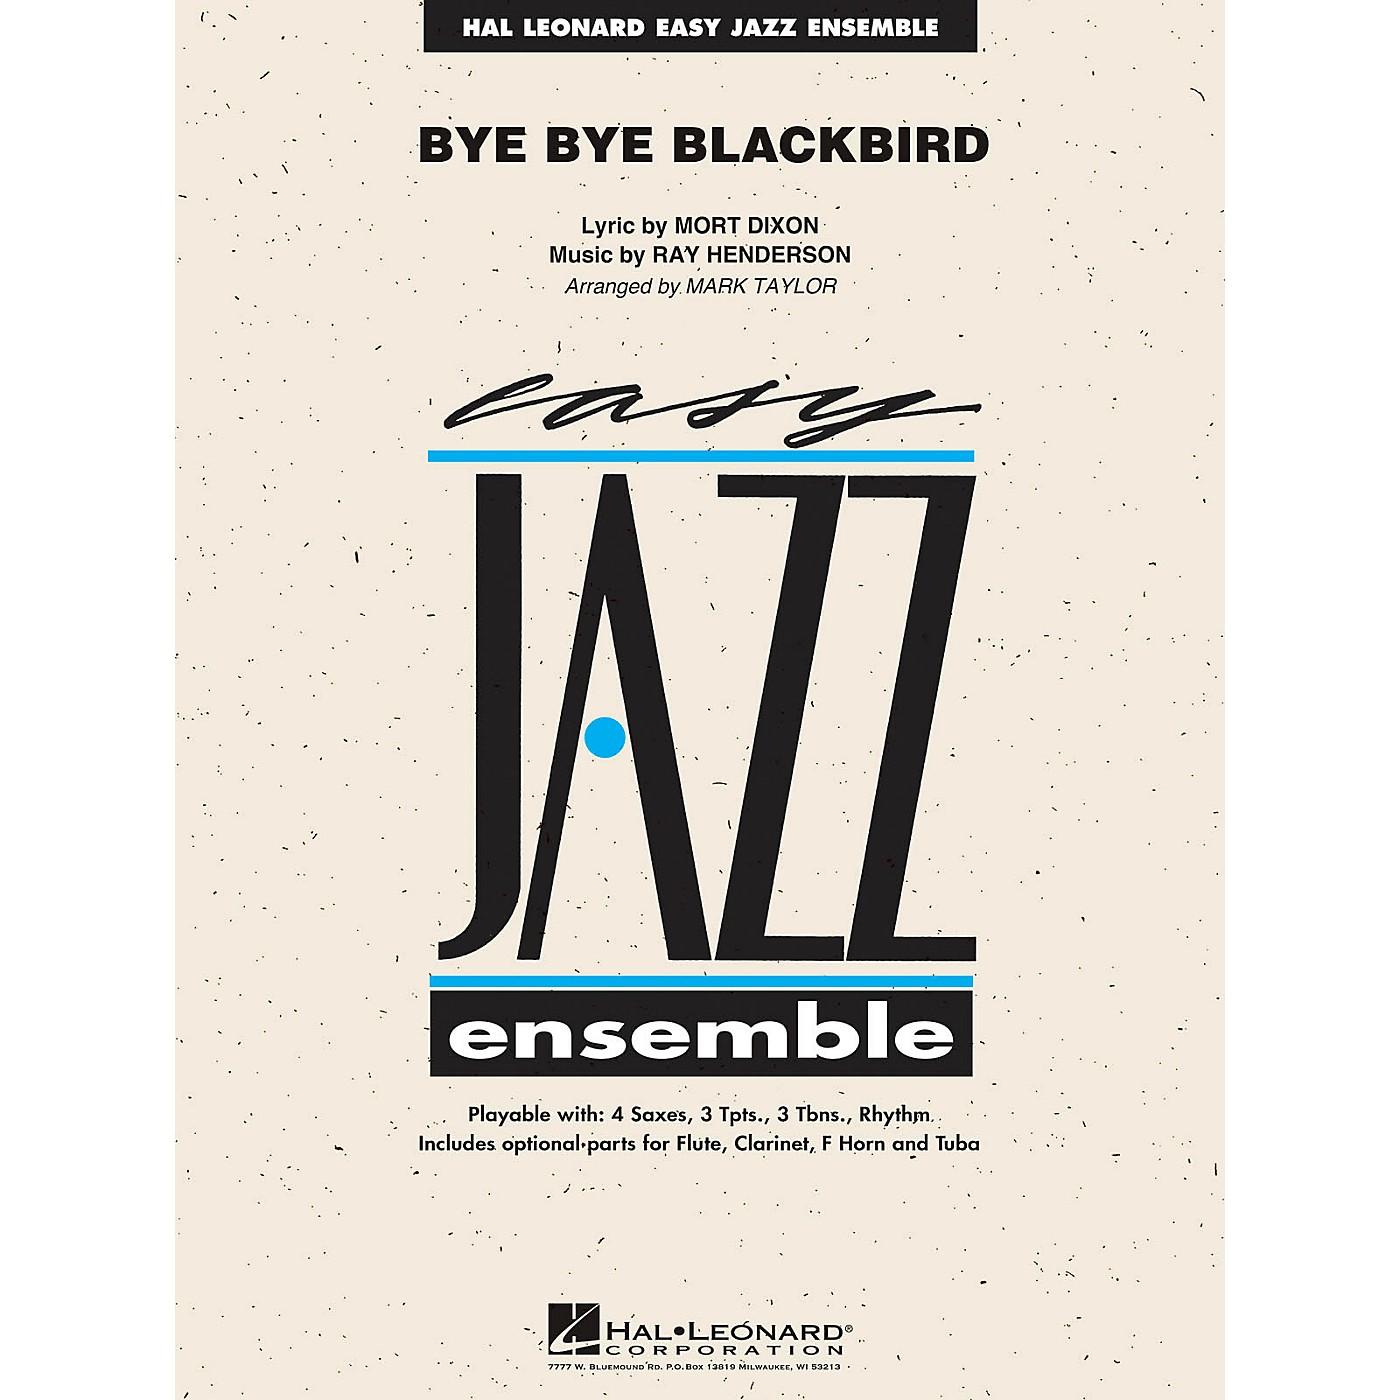 Hal Leonard Bye Bye Blackbird - Easy Jazz Ensemble Series Level 2 thumbnail